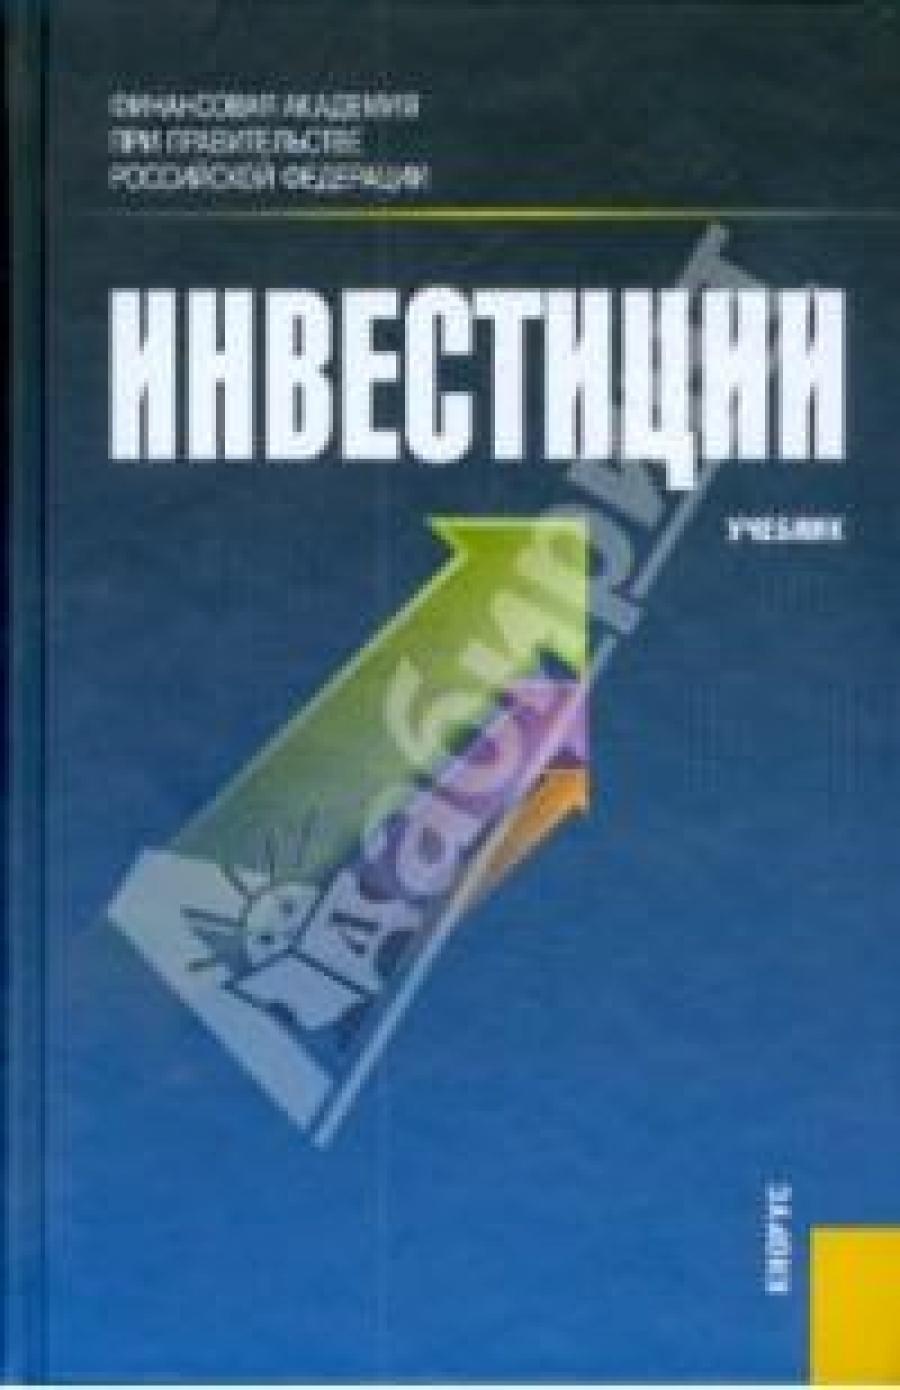 Обложка книги:  г.п. подшиваленко, н.и. лахметкина, м.в. макарова - инвестиции. 3 издание